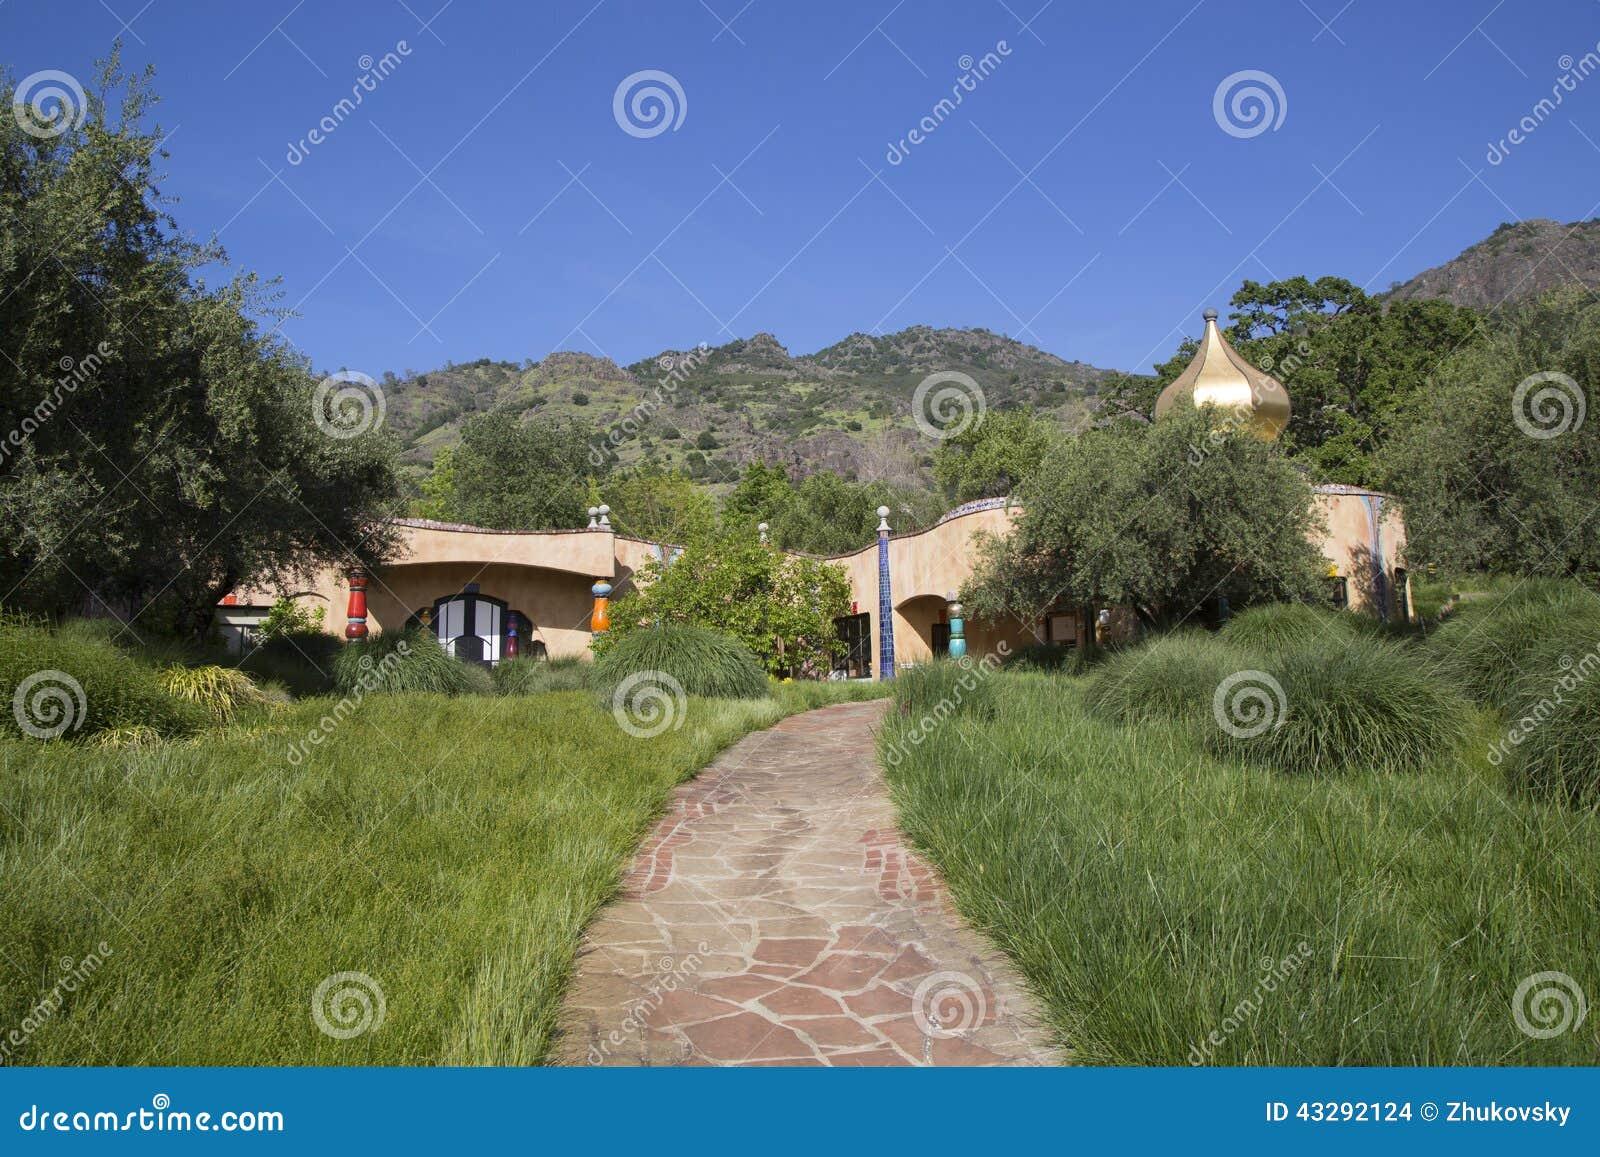 The Quixote Winery in Napa Valley built by Viennese architect Friedensreich Hundertwasser